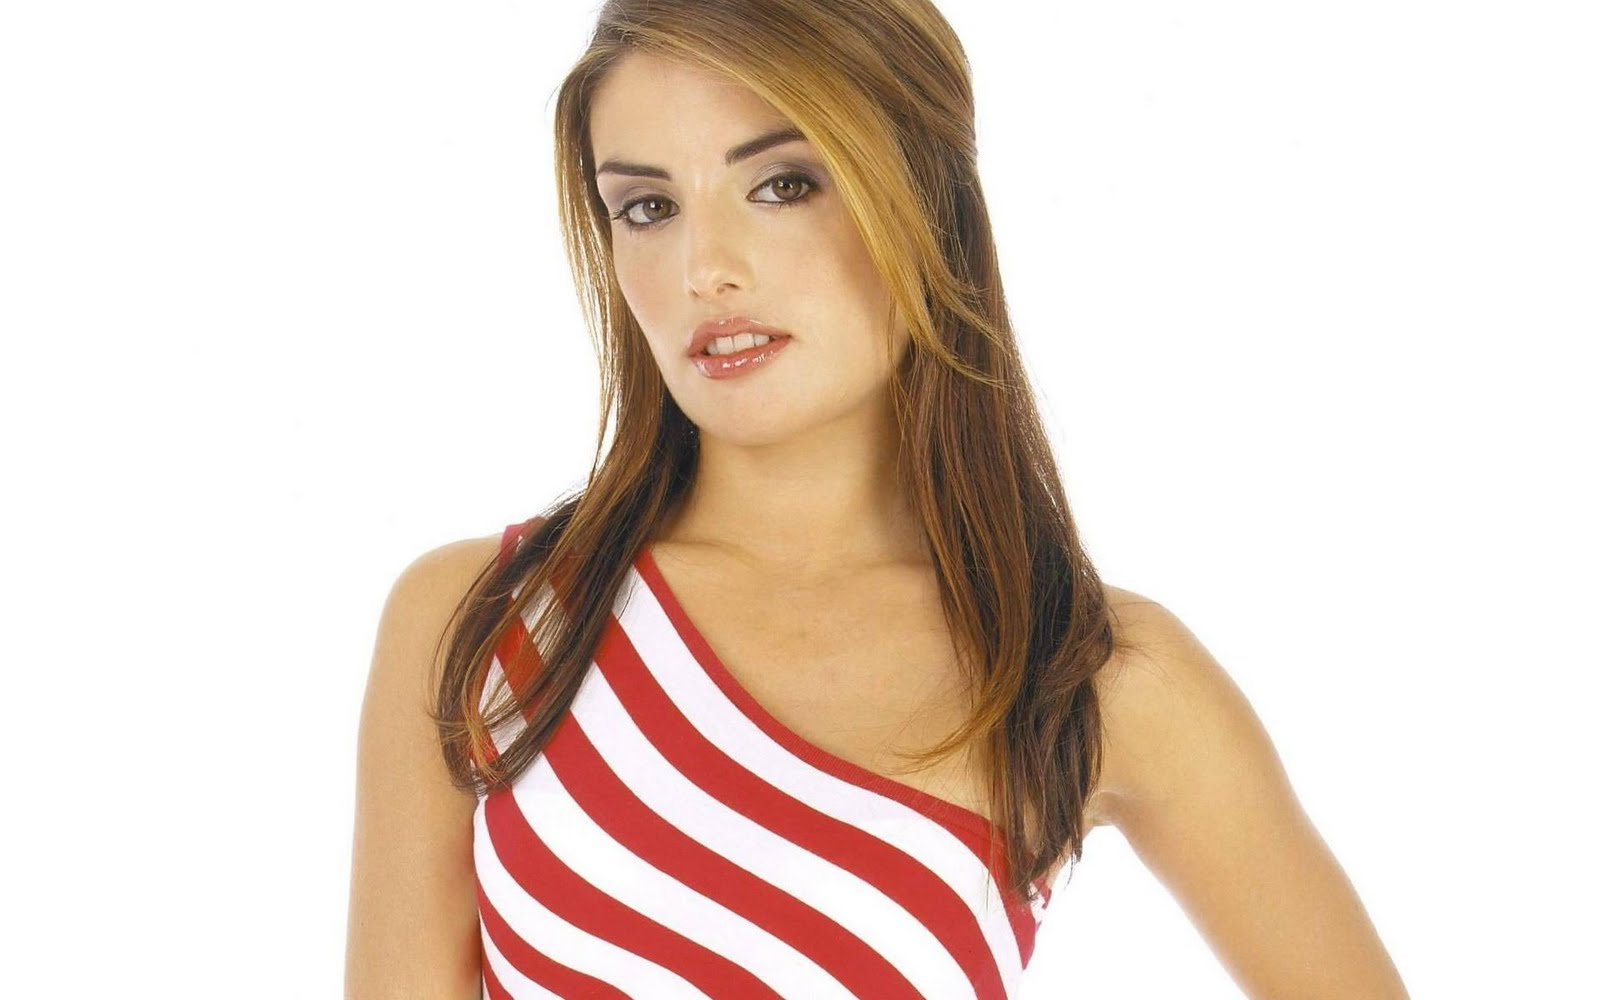 Hollywood Actress Hot Photo Gallery - PHOTO & WALLPAPER ...